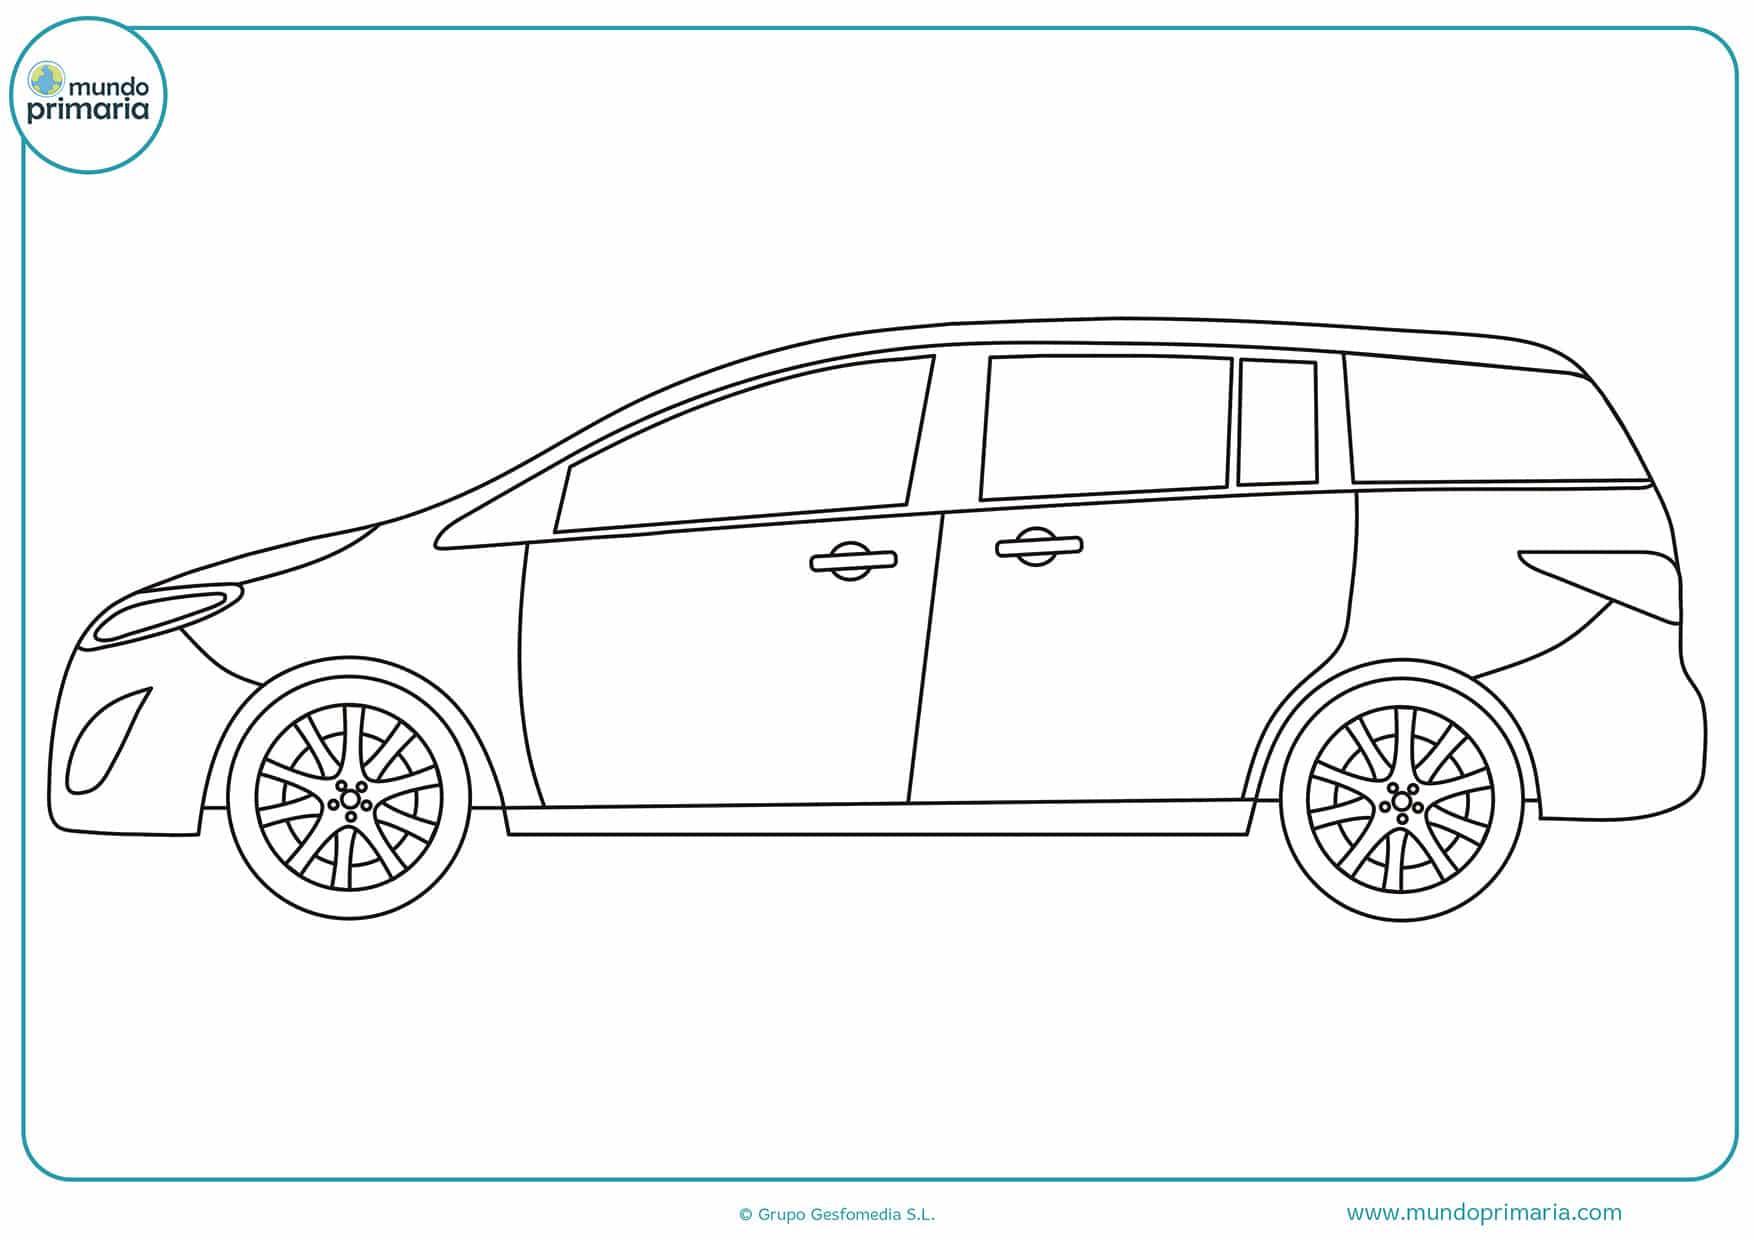 Dibujos carros colorear infantiles